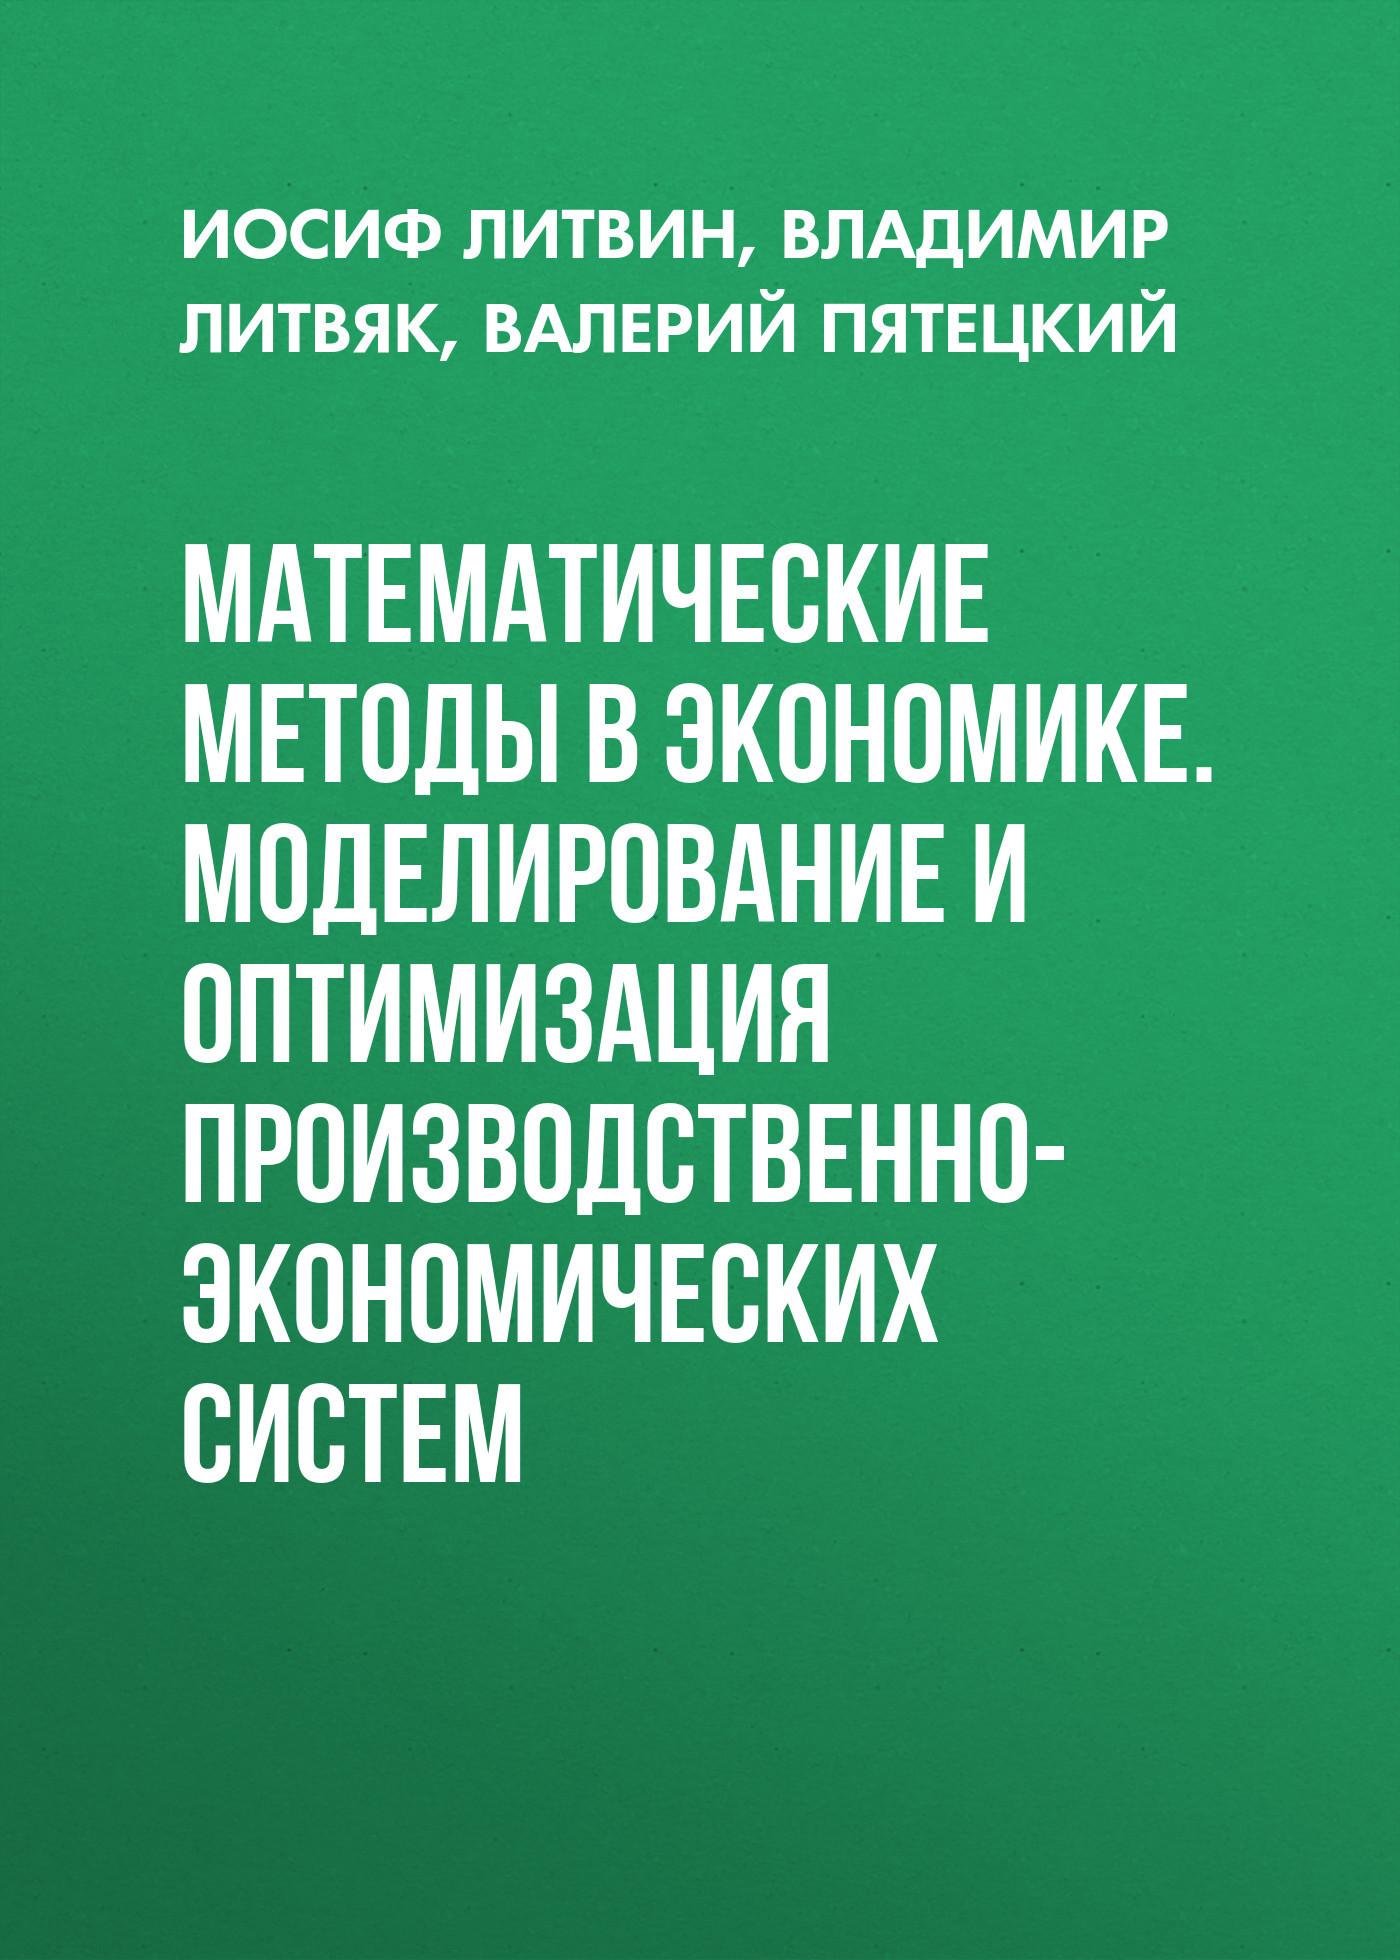 Валерий Пятецкий бесплатно